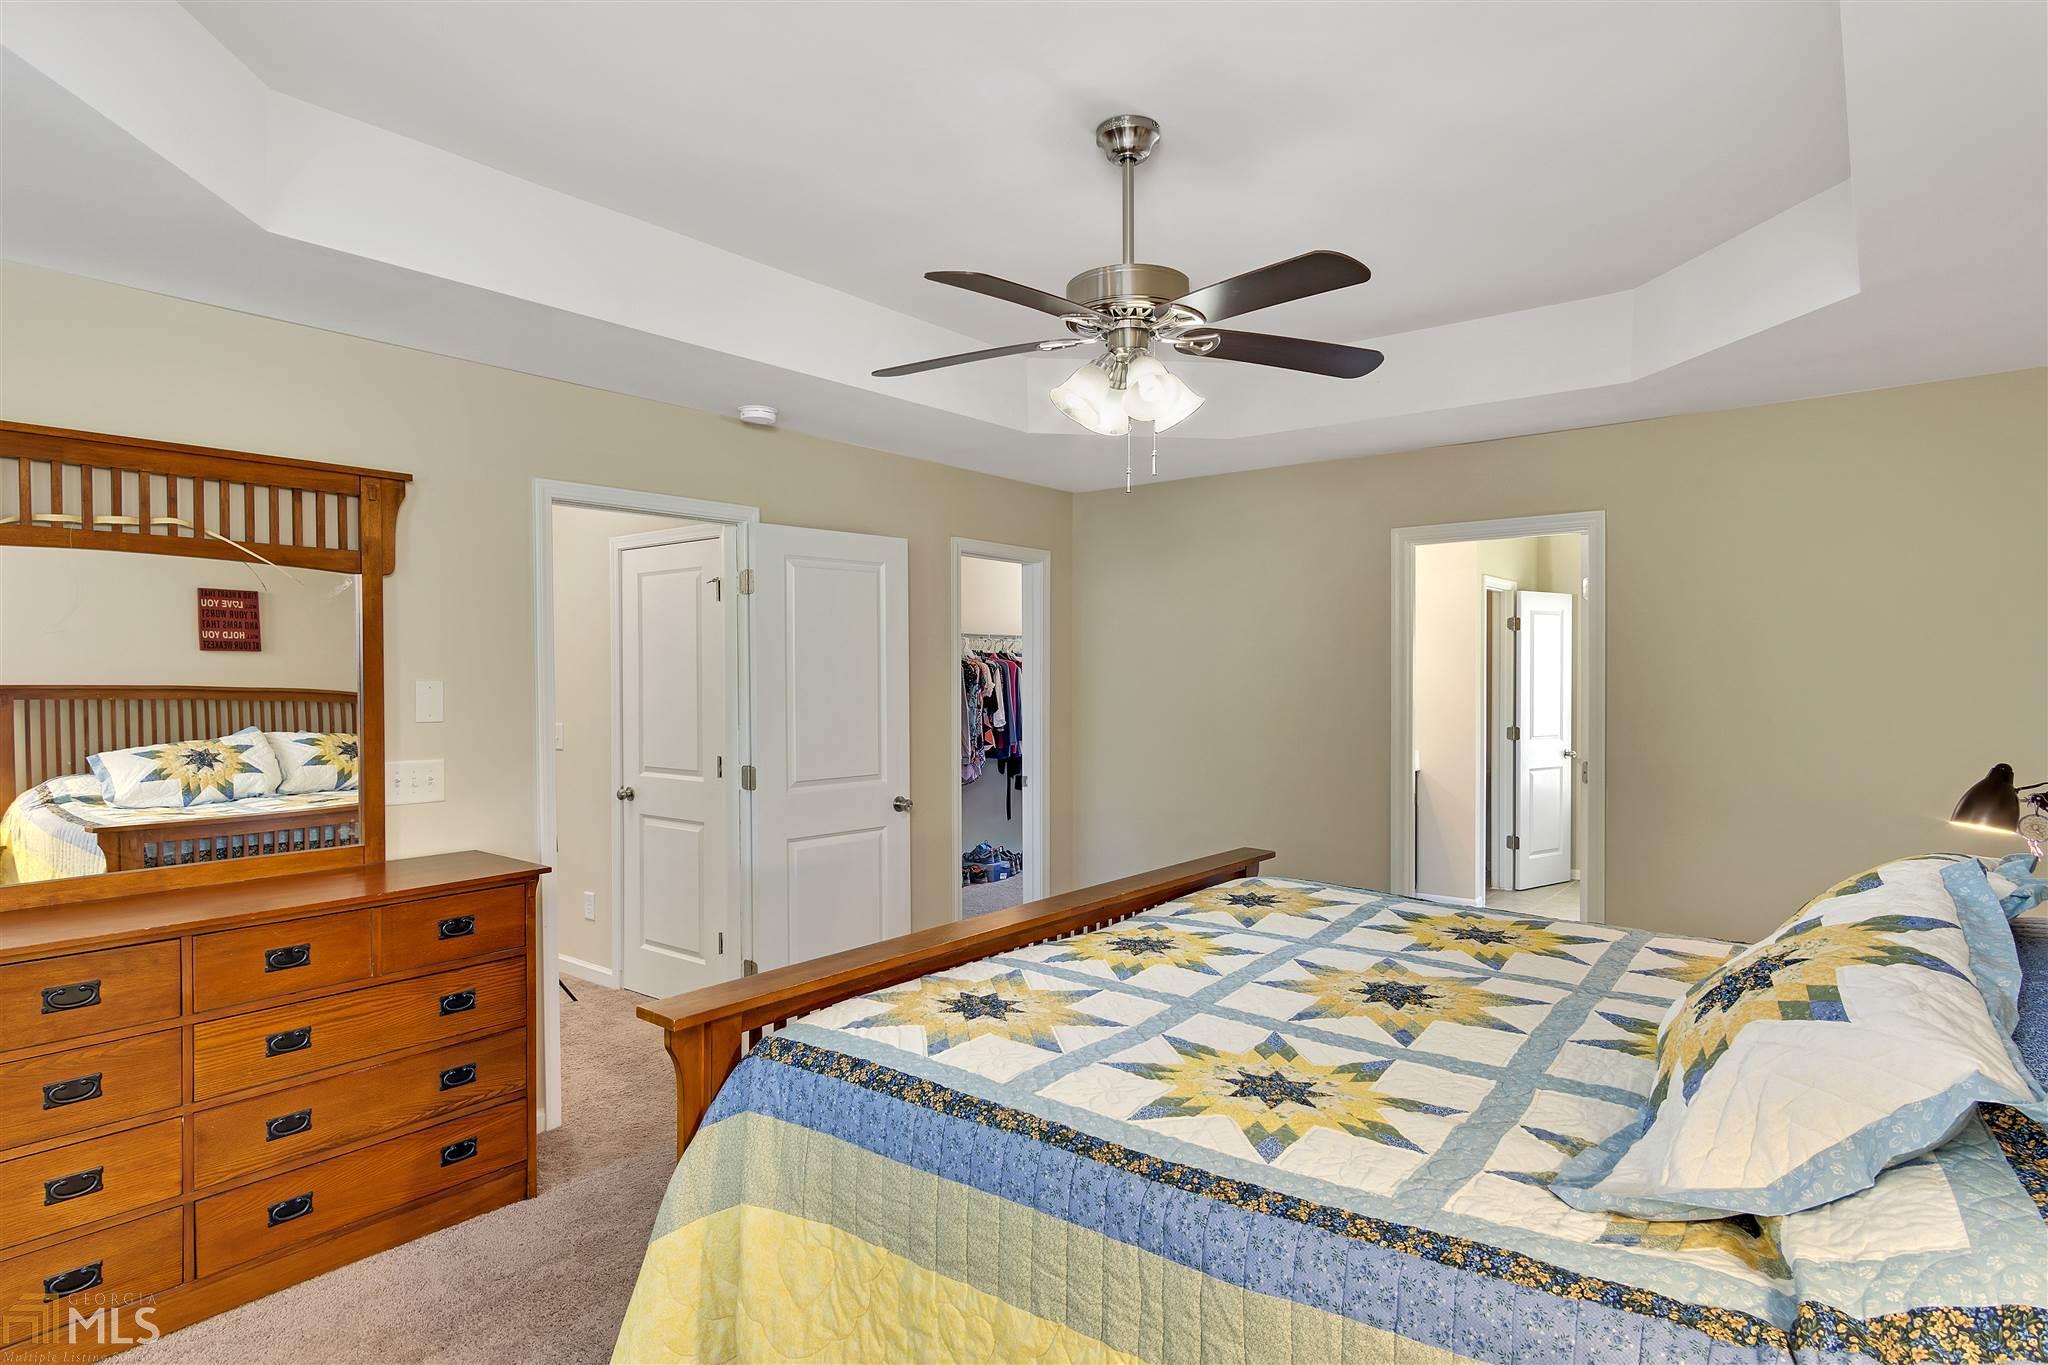 185 Homestead Way Covington, GA